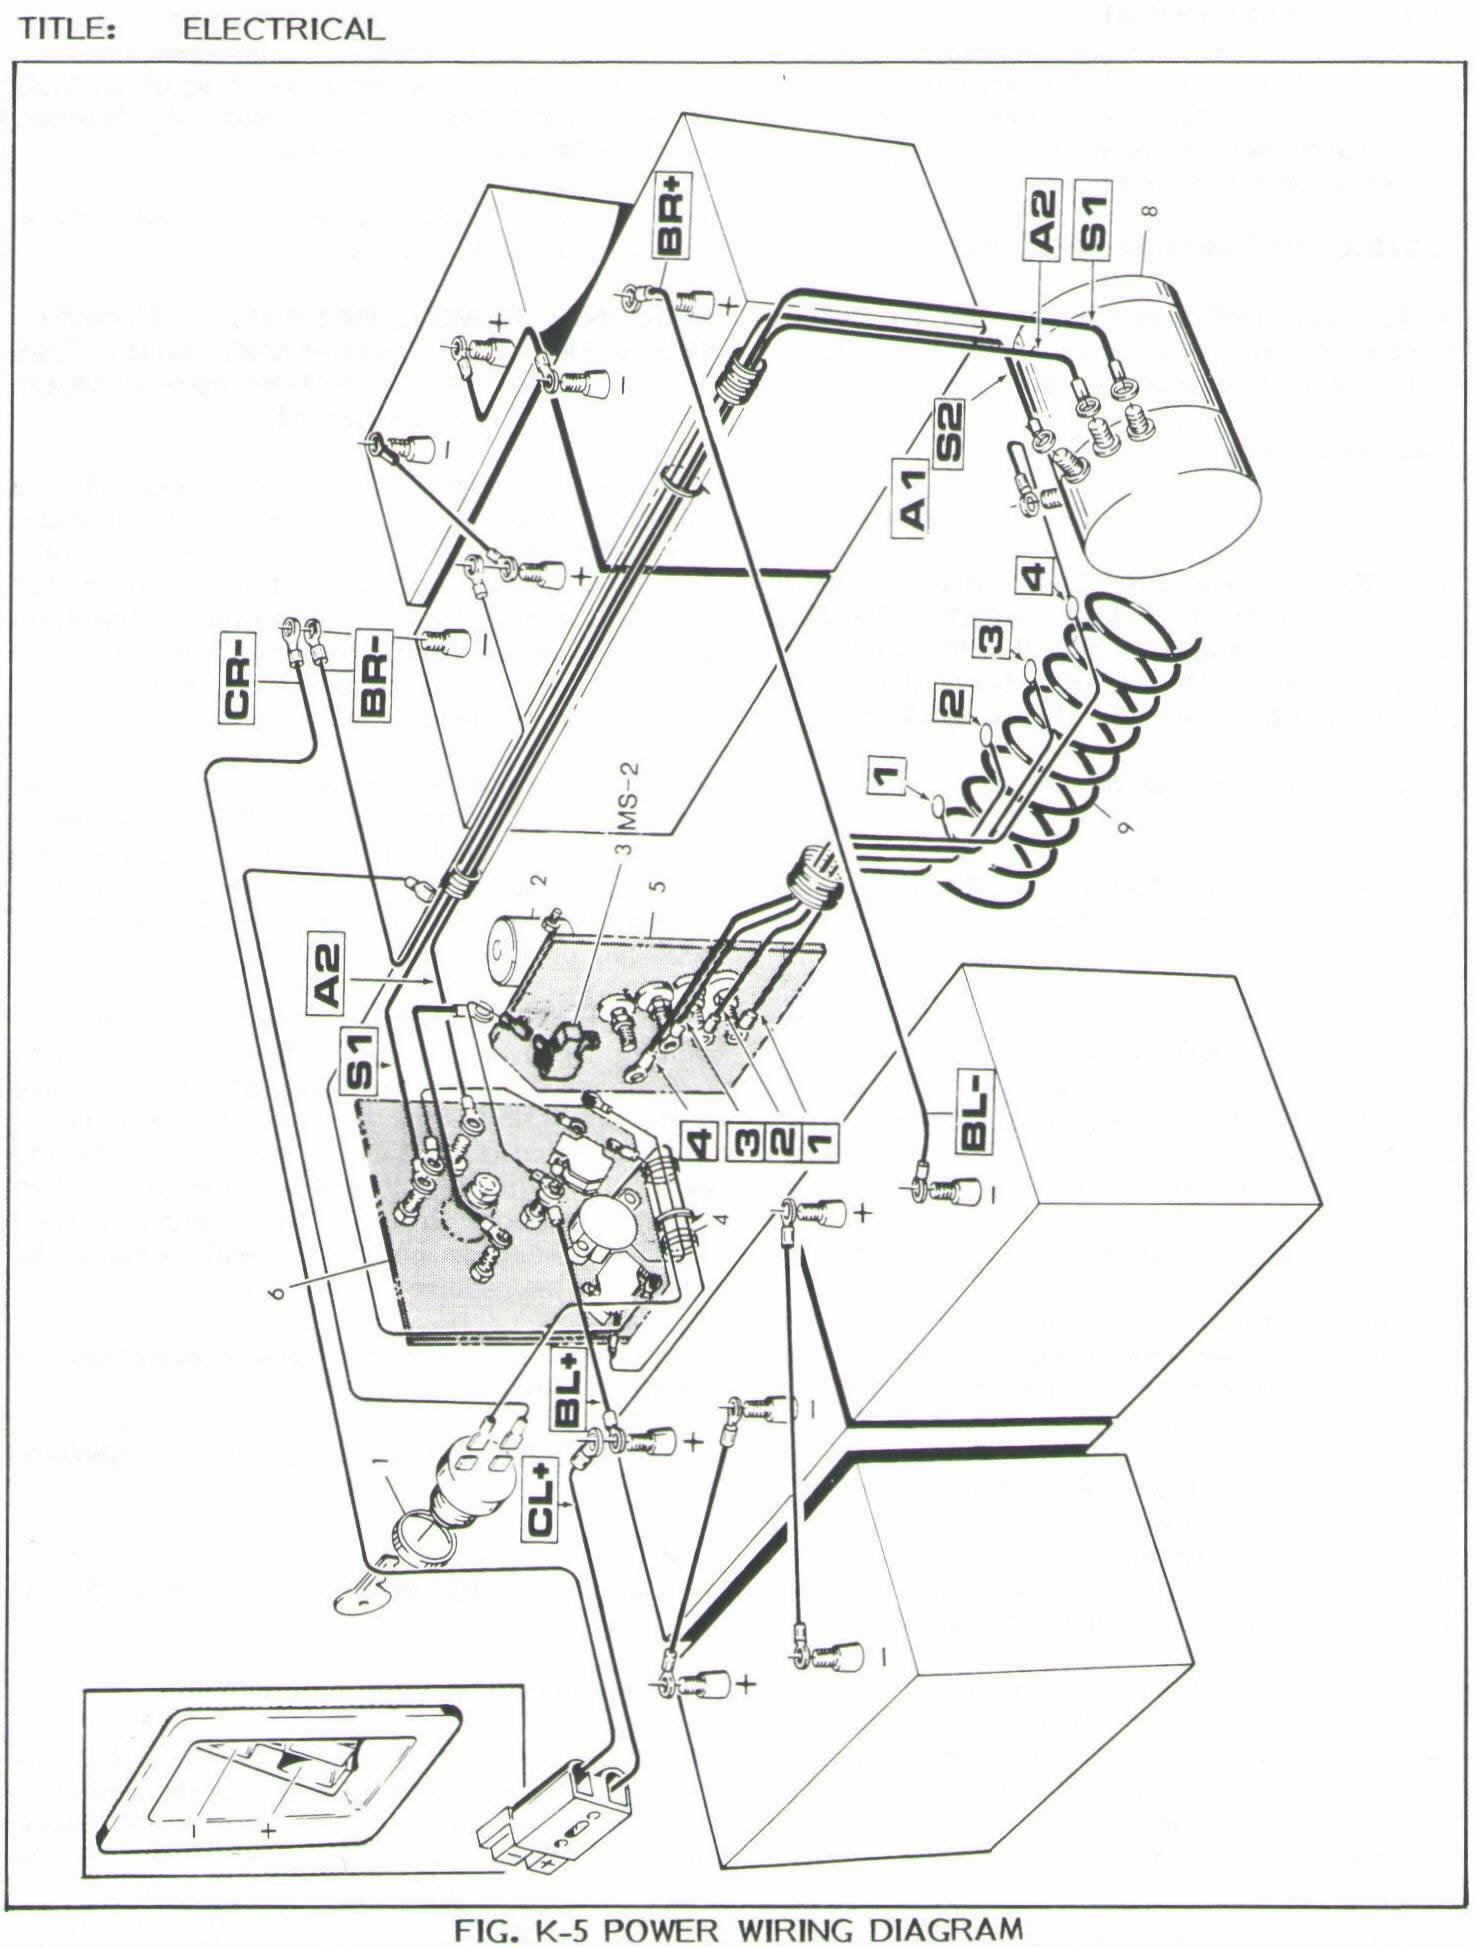 [SCHEMATICS_48EU]  MF_1805] Ez Go Textron Wiring Diagram Resistor Free Diagram | 1989 Electric Ezgo Electric Marathon Resistor Wiring Diagrams |  | Exxlu Puti Mohammedshrine Librar Wiring 101